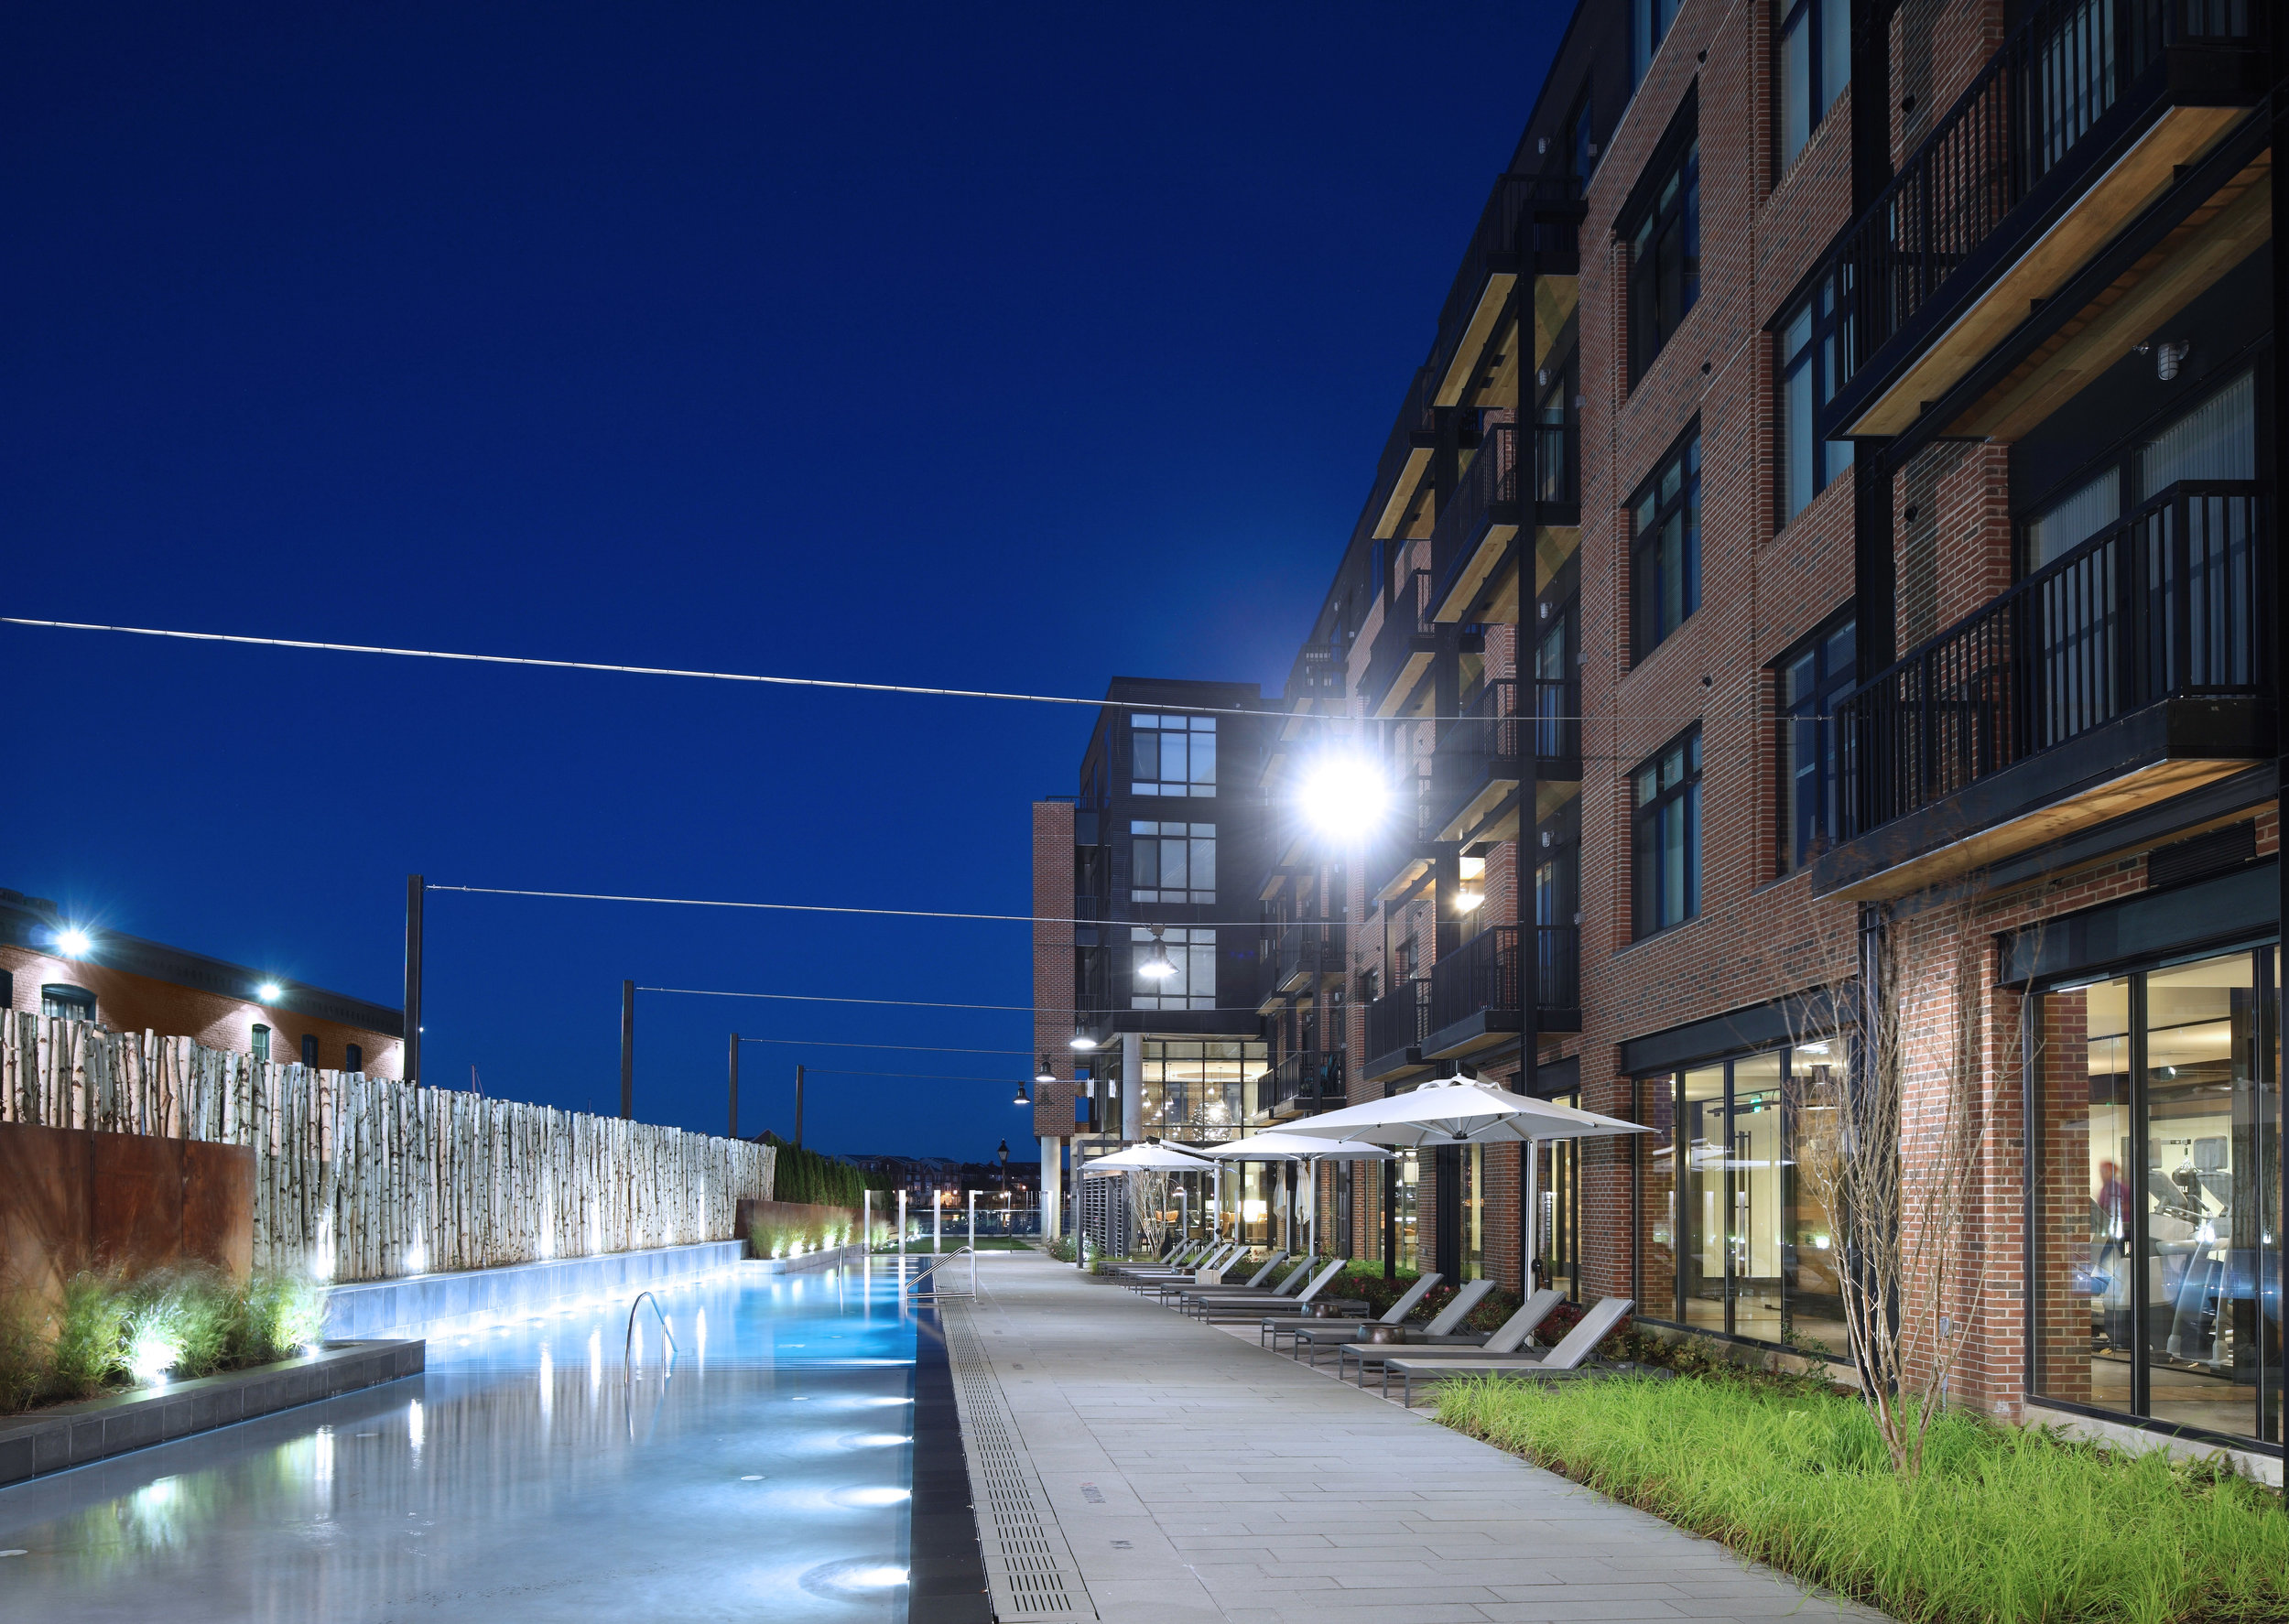 Union Wharf Exterior Pool.jpg